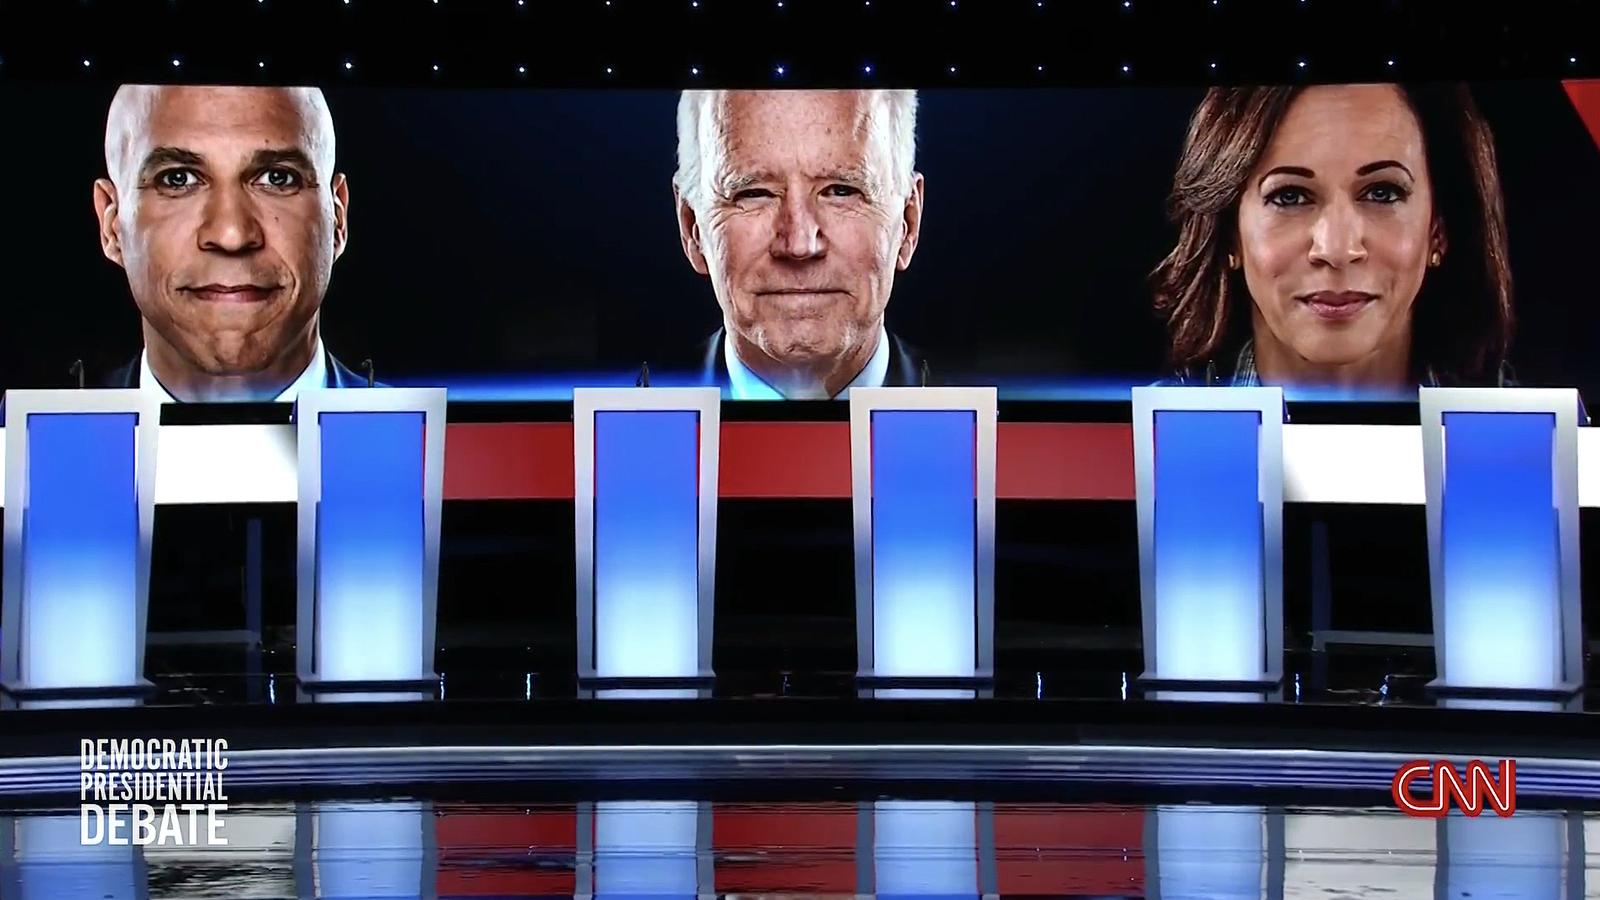 NCS_CNN-Dem-Debate-Cold-Open_Graphics_0010